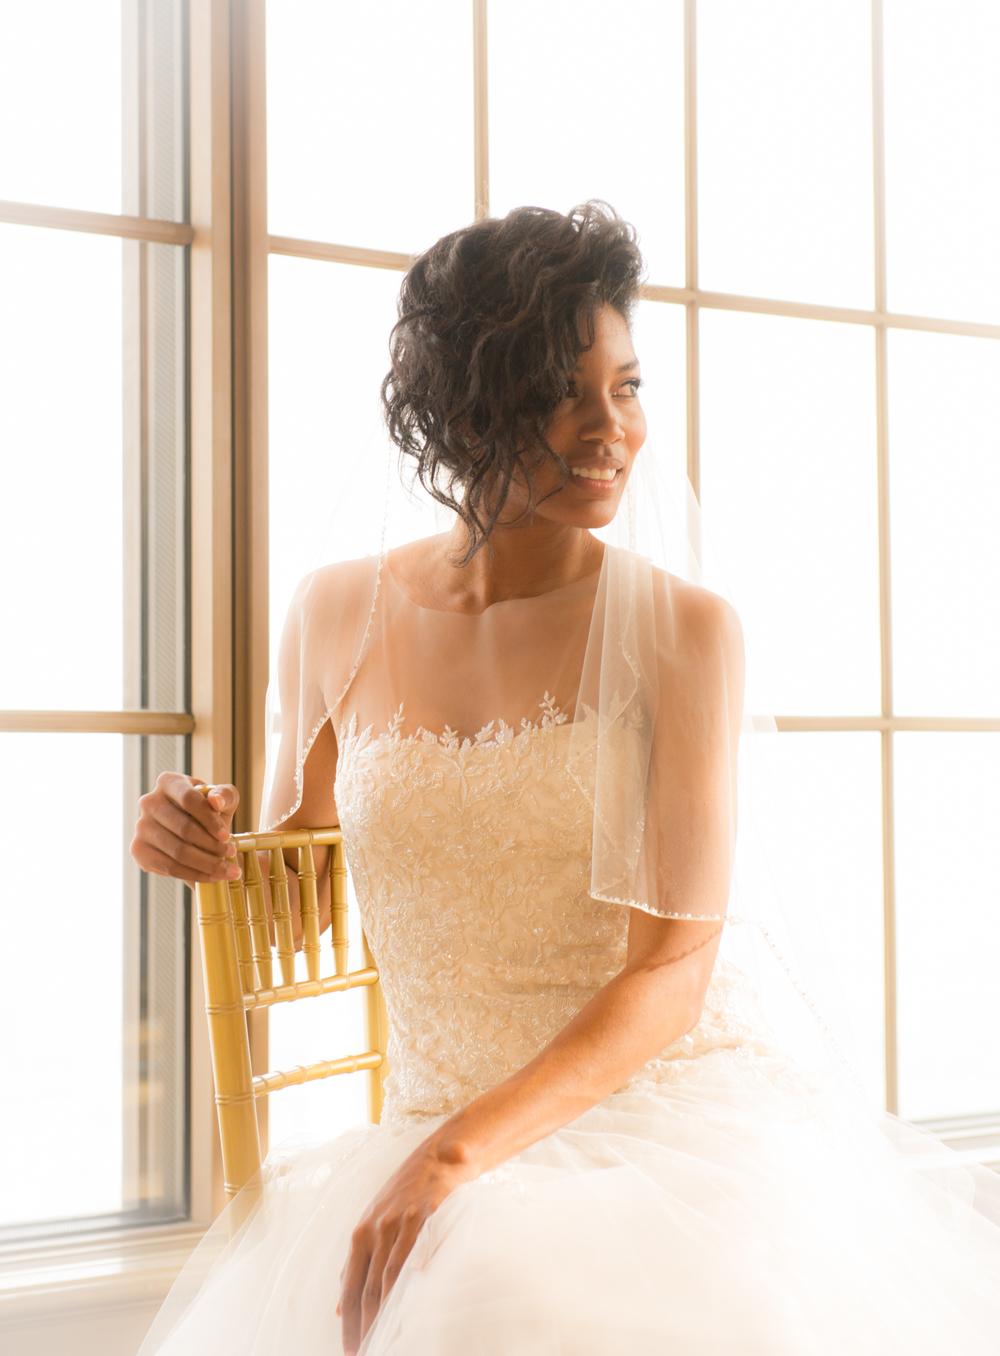 Model: Latoya Hunt // Hair: Adrian De Lozada | Umbrella Salon //  Make-Up: Jennifer Toy //  Photography:  Khiem Hoang